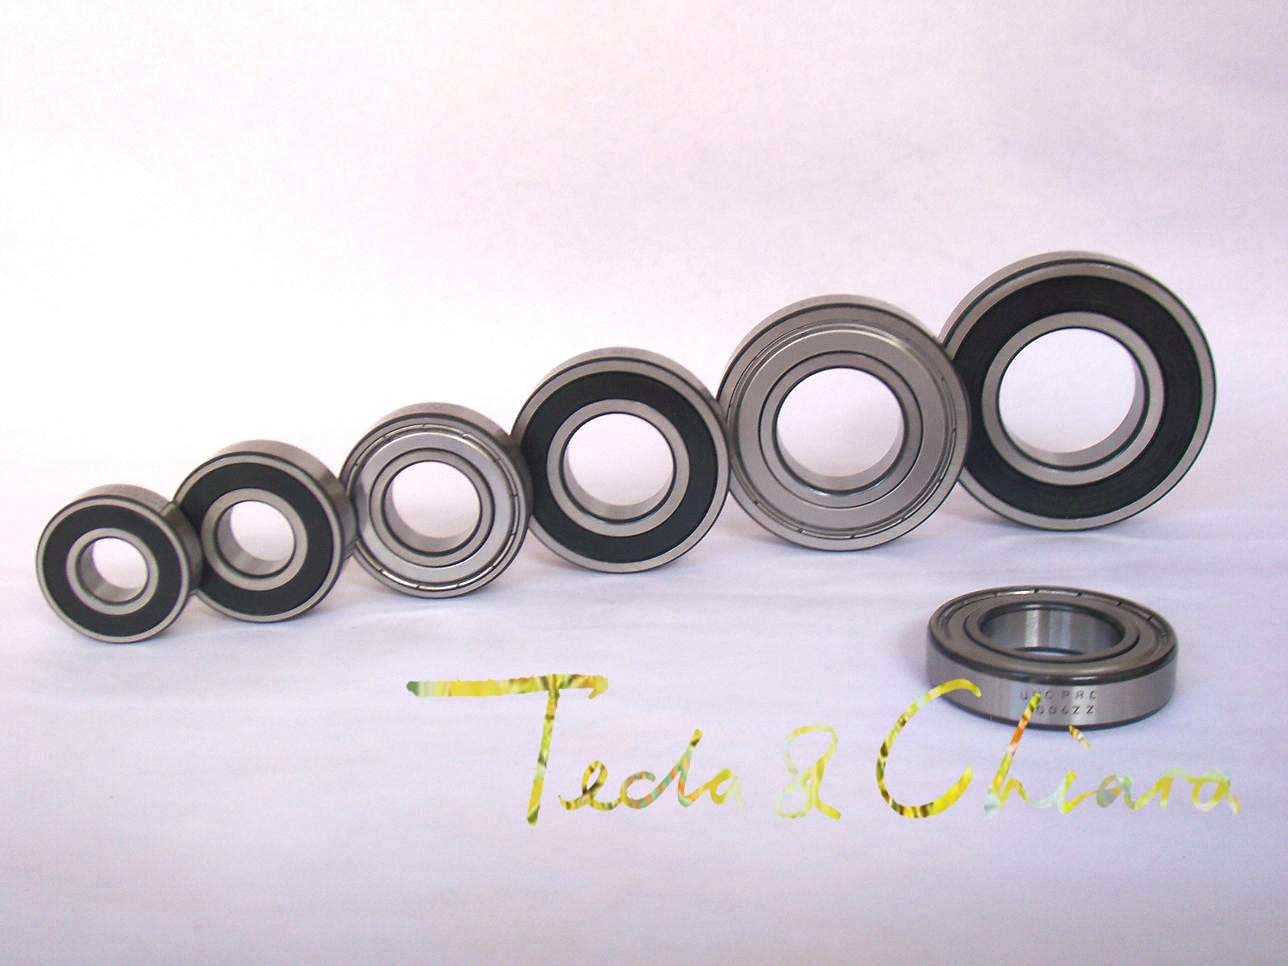 mr148-mr148zz-mr148rs-mr148-2z-mr148z-mr148-2rs-zz-rs-rz-2rz-l-1480zz-deep-groove-ball-bearings-8-x-14-x-4mm